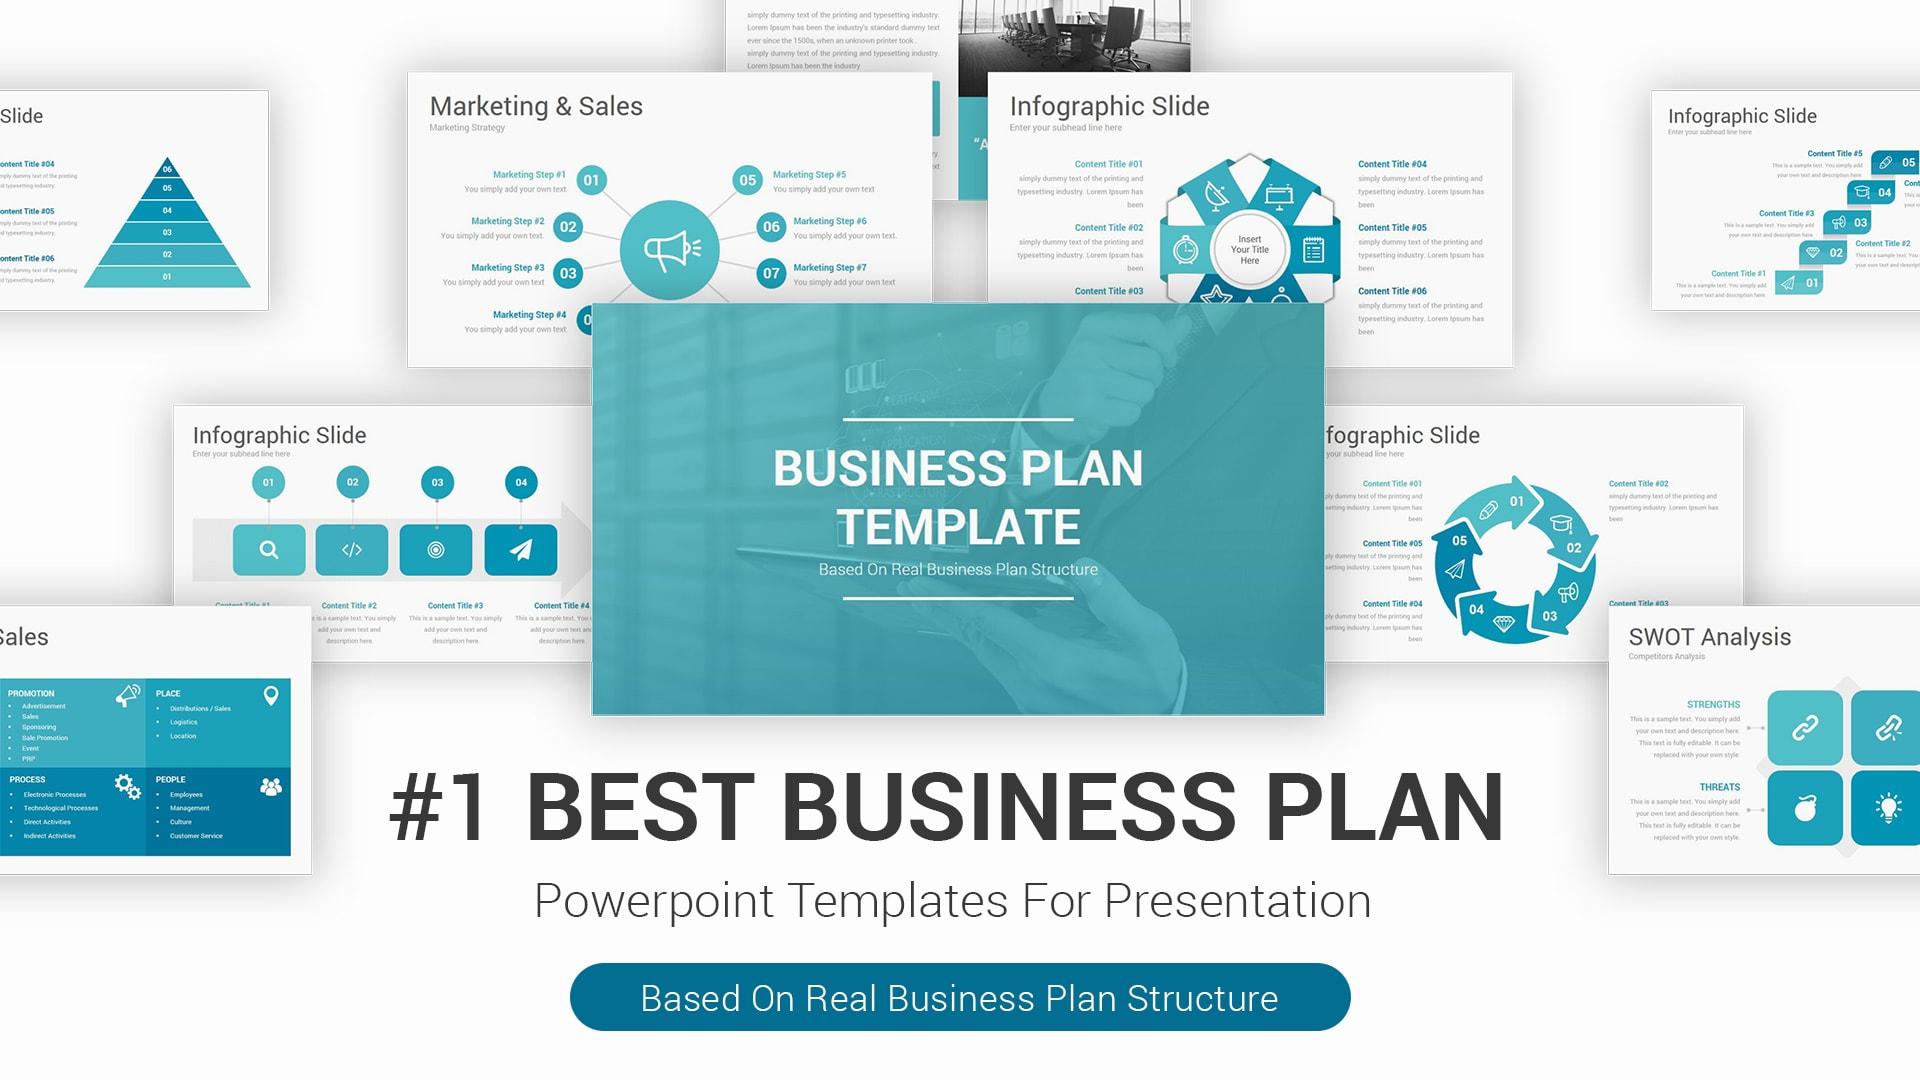 Best-Business-Plan-PowerPoint-Presentation-Templates